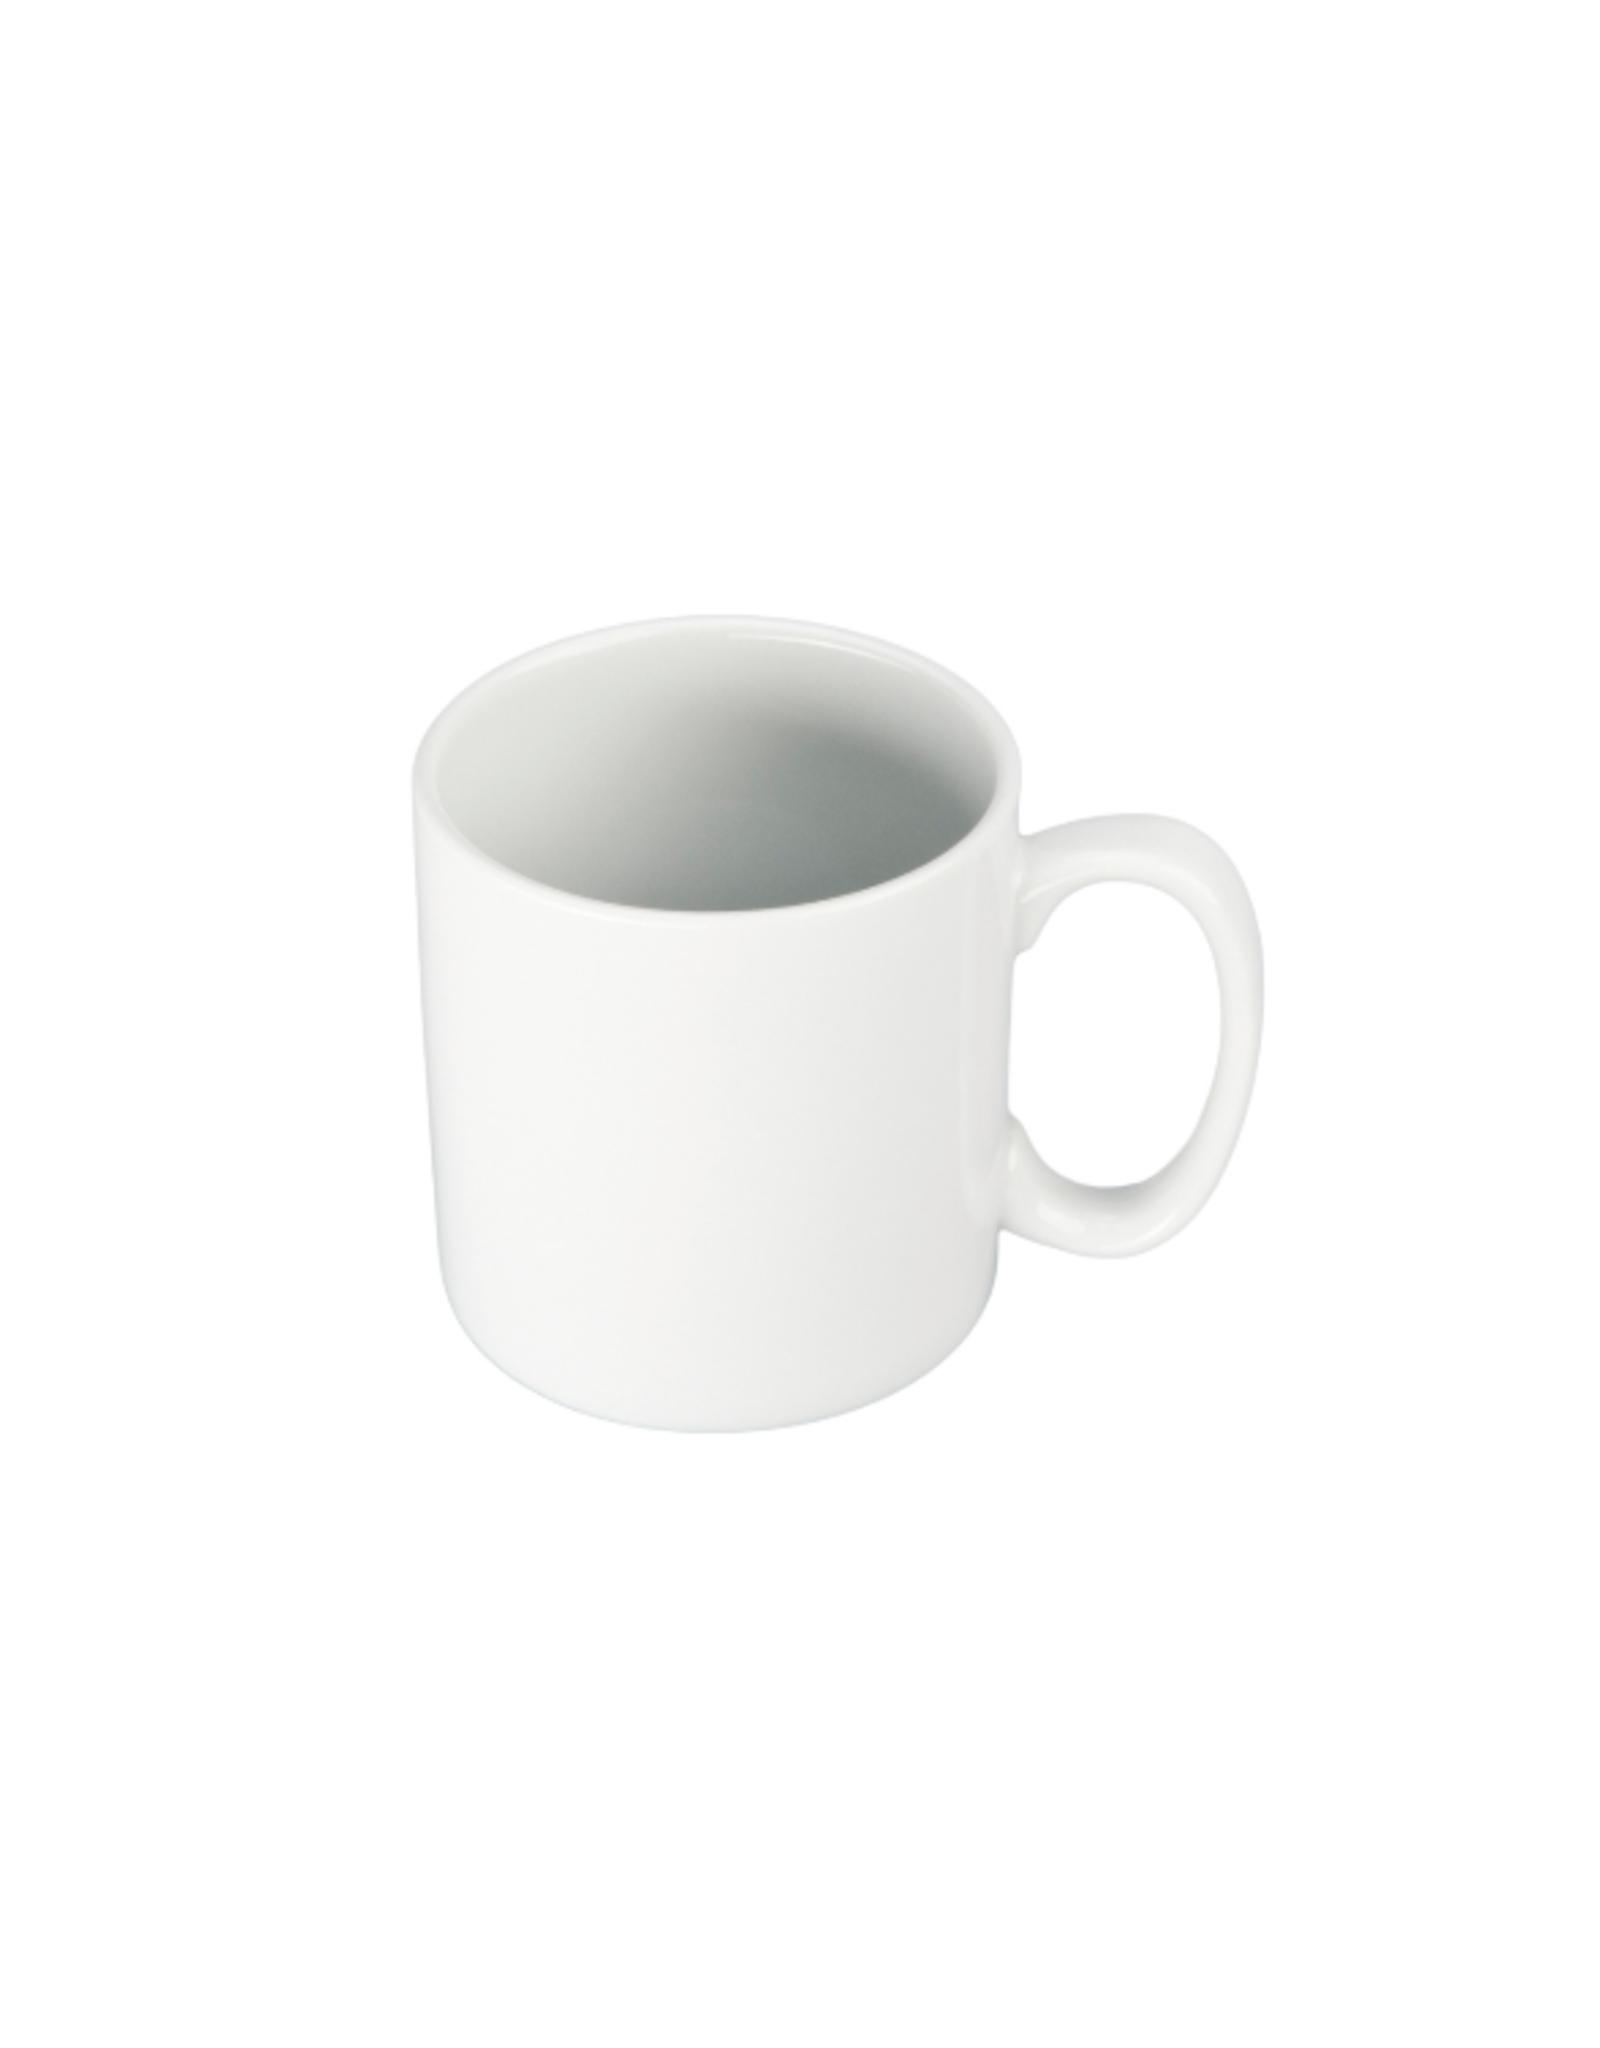 BIA Cordon Bleu Mug, Stackable 16 oz